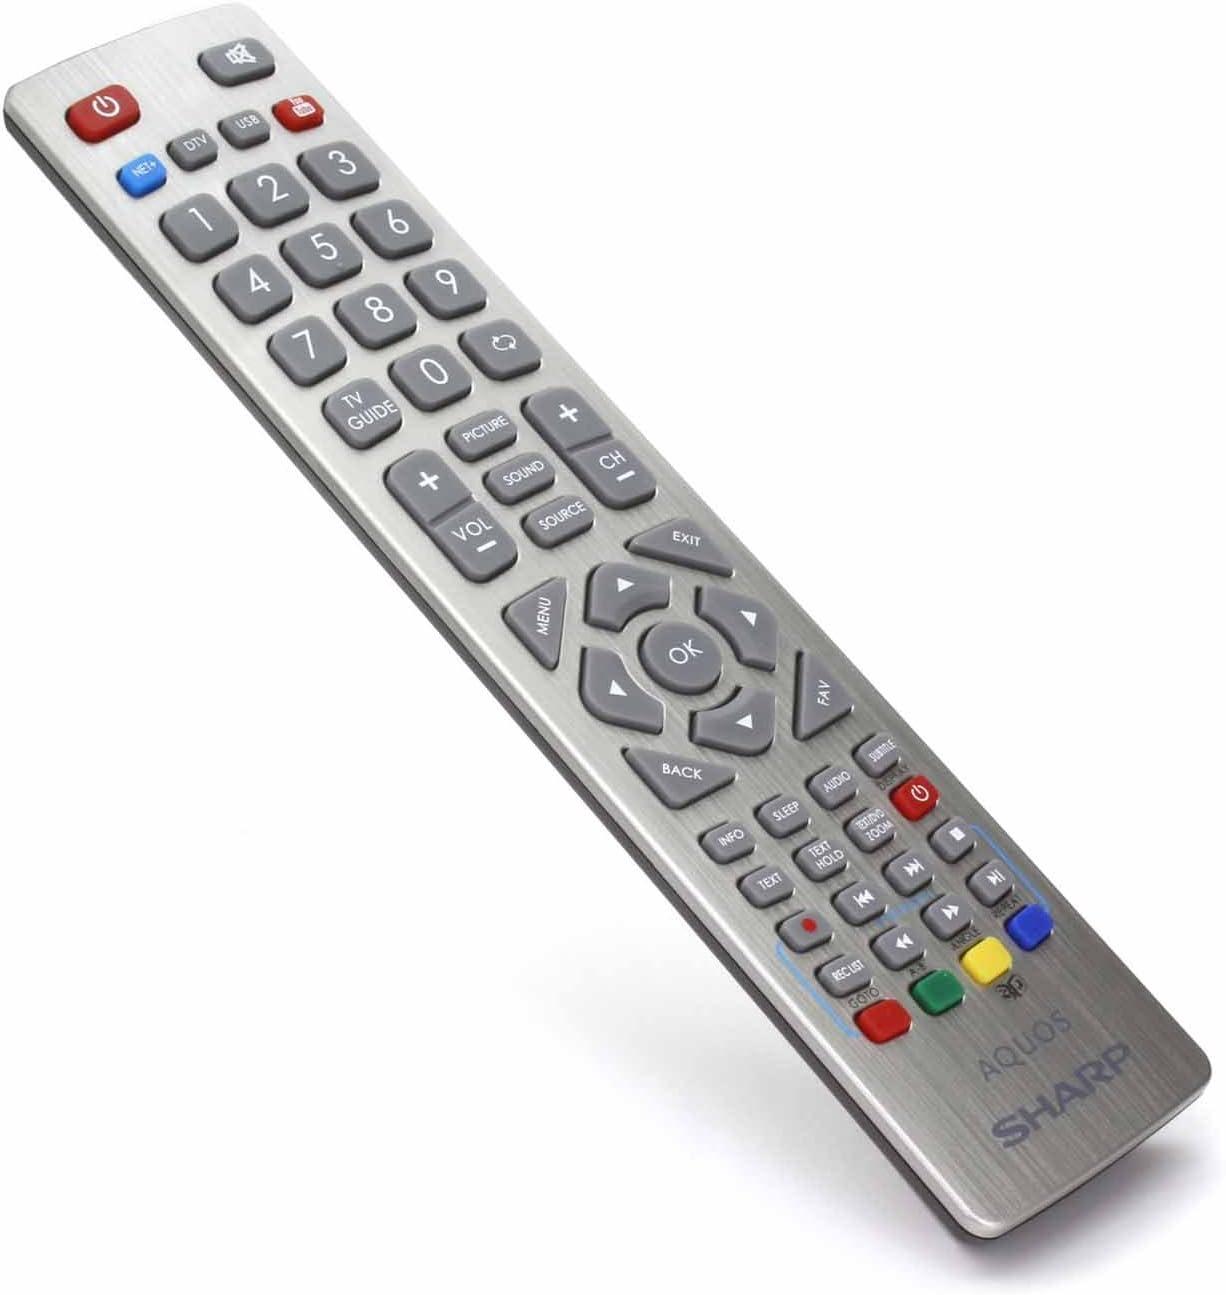 Control Remoto para Sharp Aquos SHW/RMC/0003 Full HD Smart LED TVS: Amazon.es: Electrónica